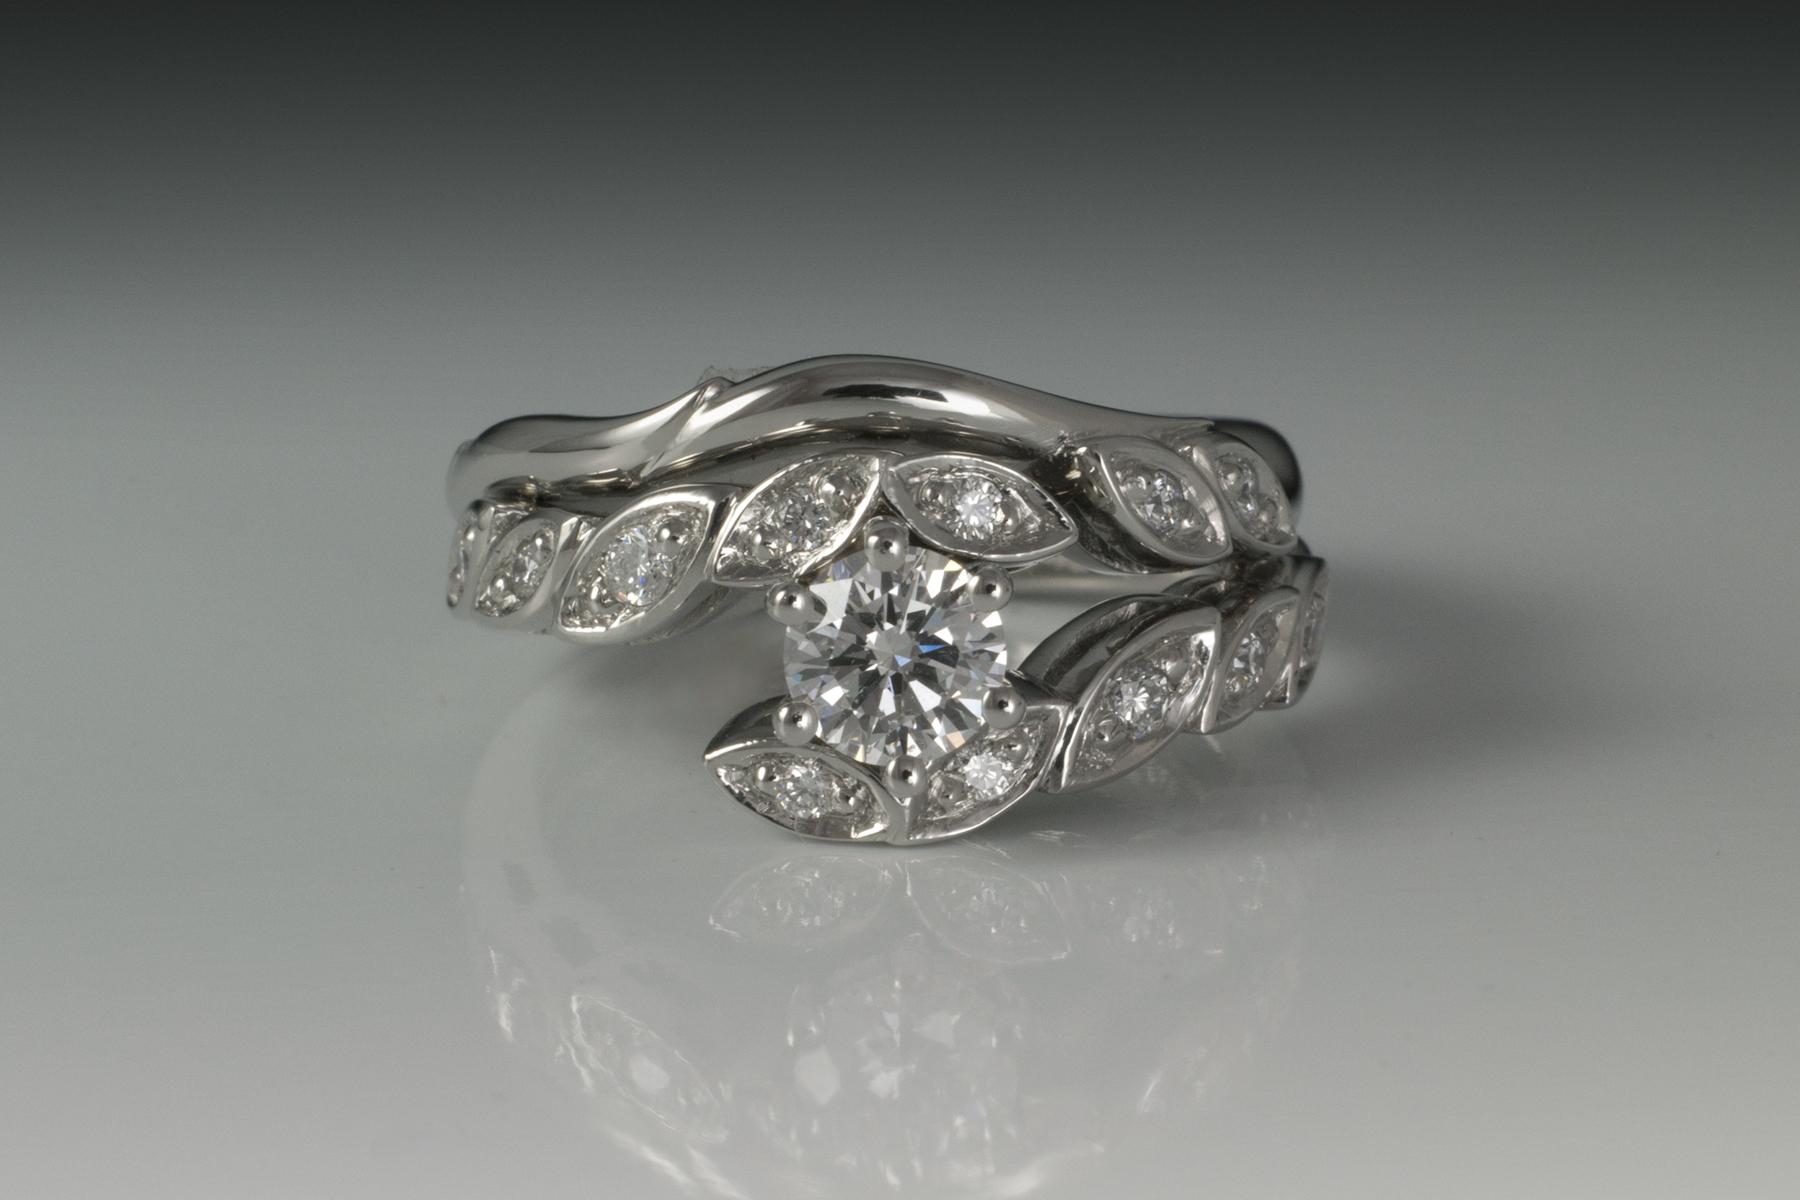 PRINT Canadian diamonds platinum 2013 Image 7778.jpg